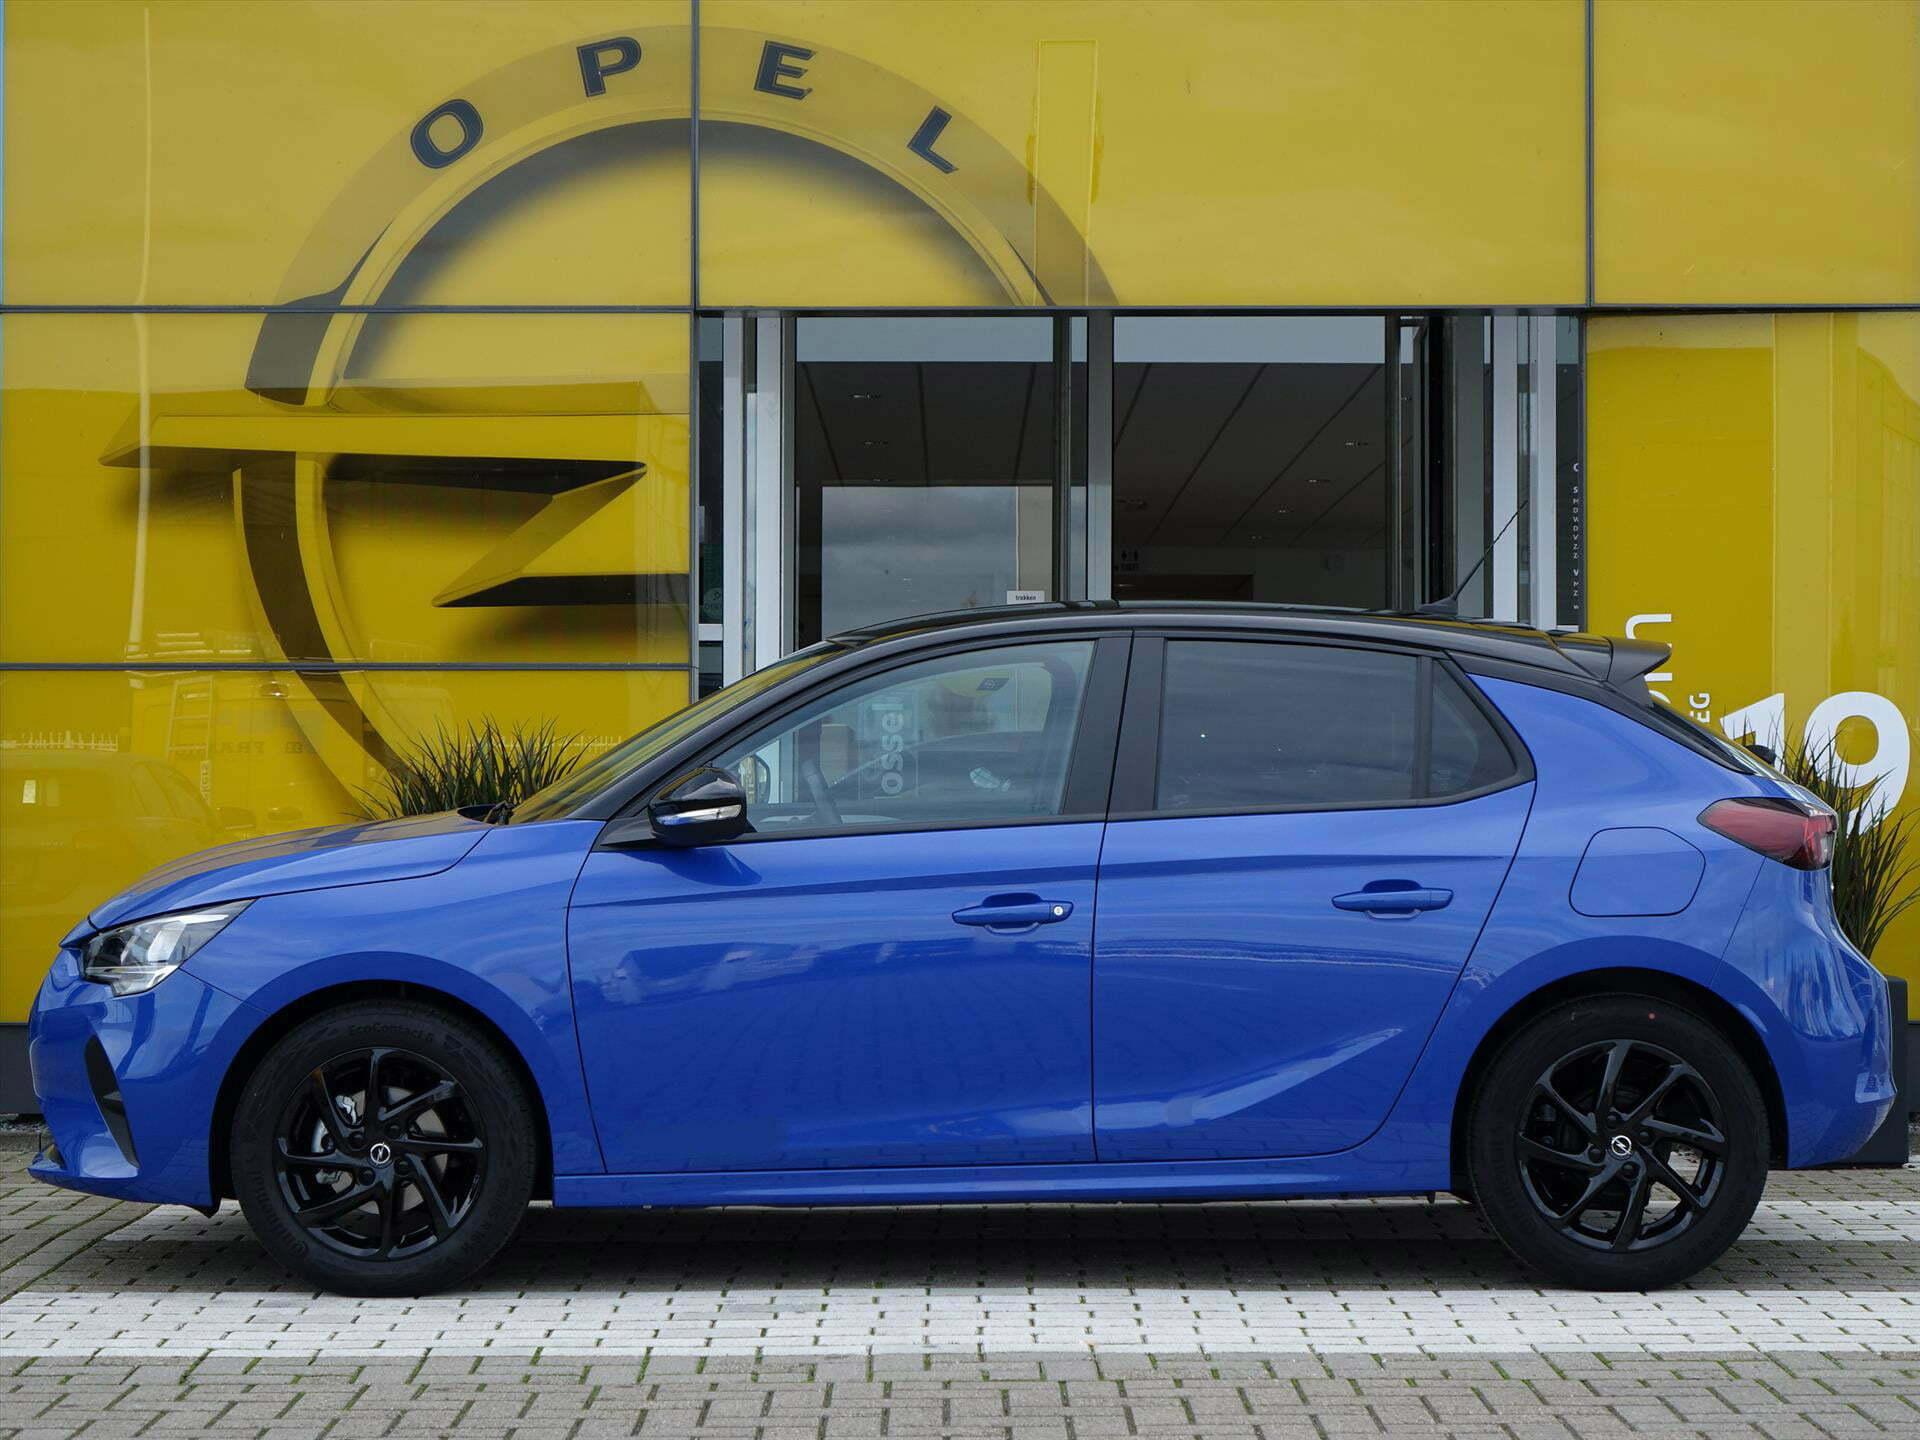 Opel Corsa 1.2 75pk Edition 5d.